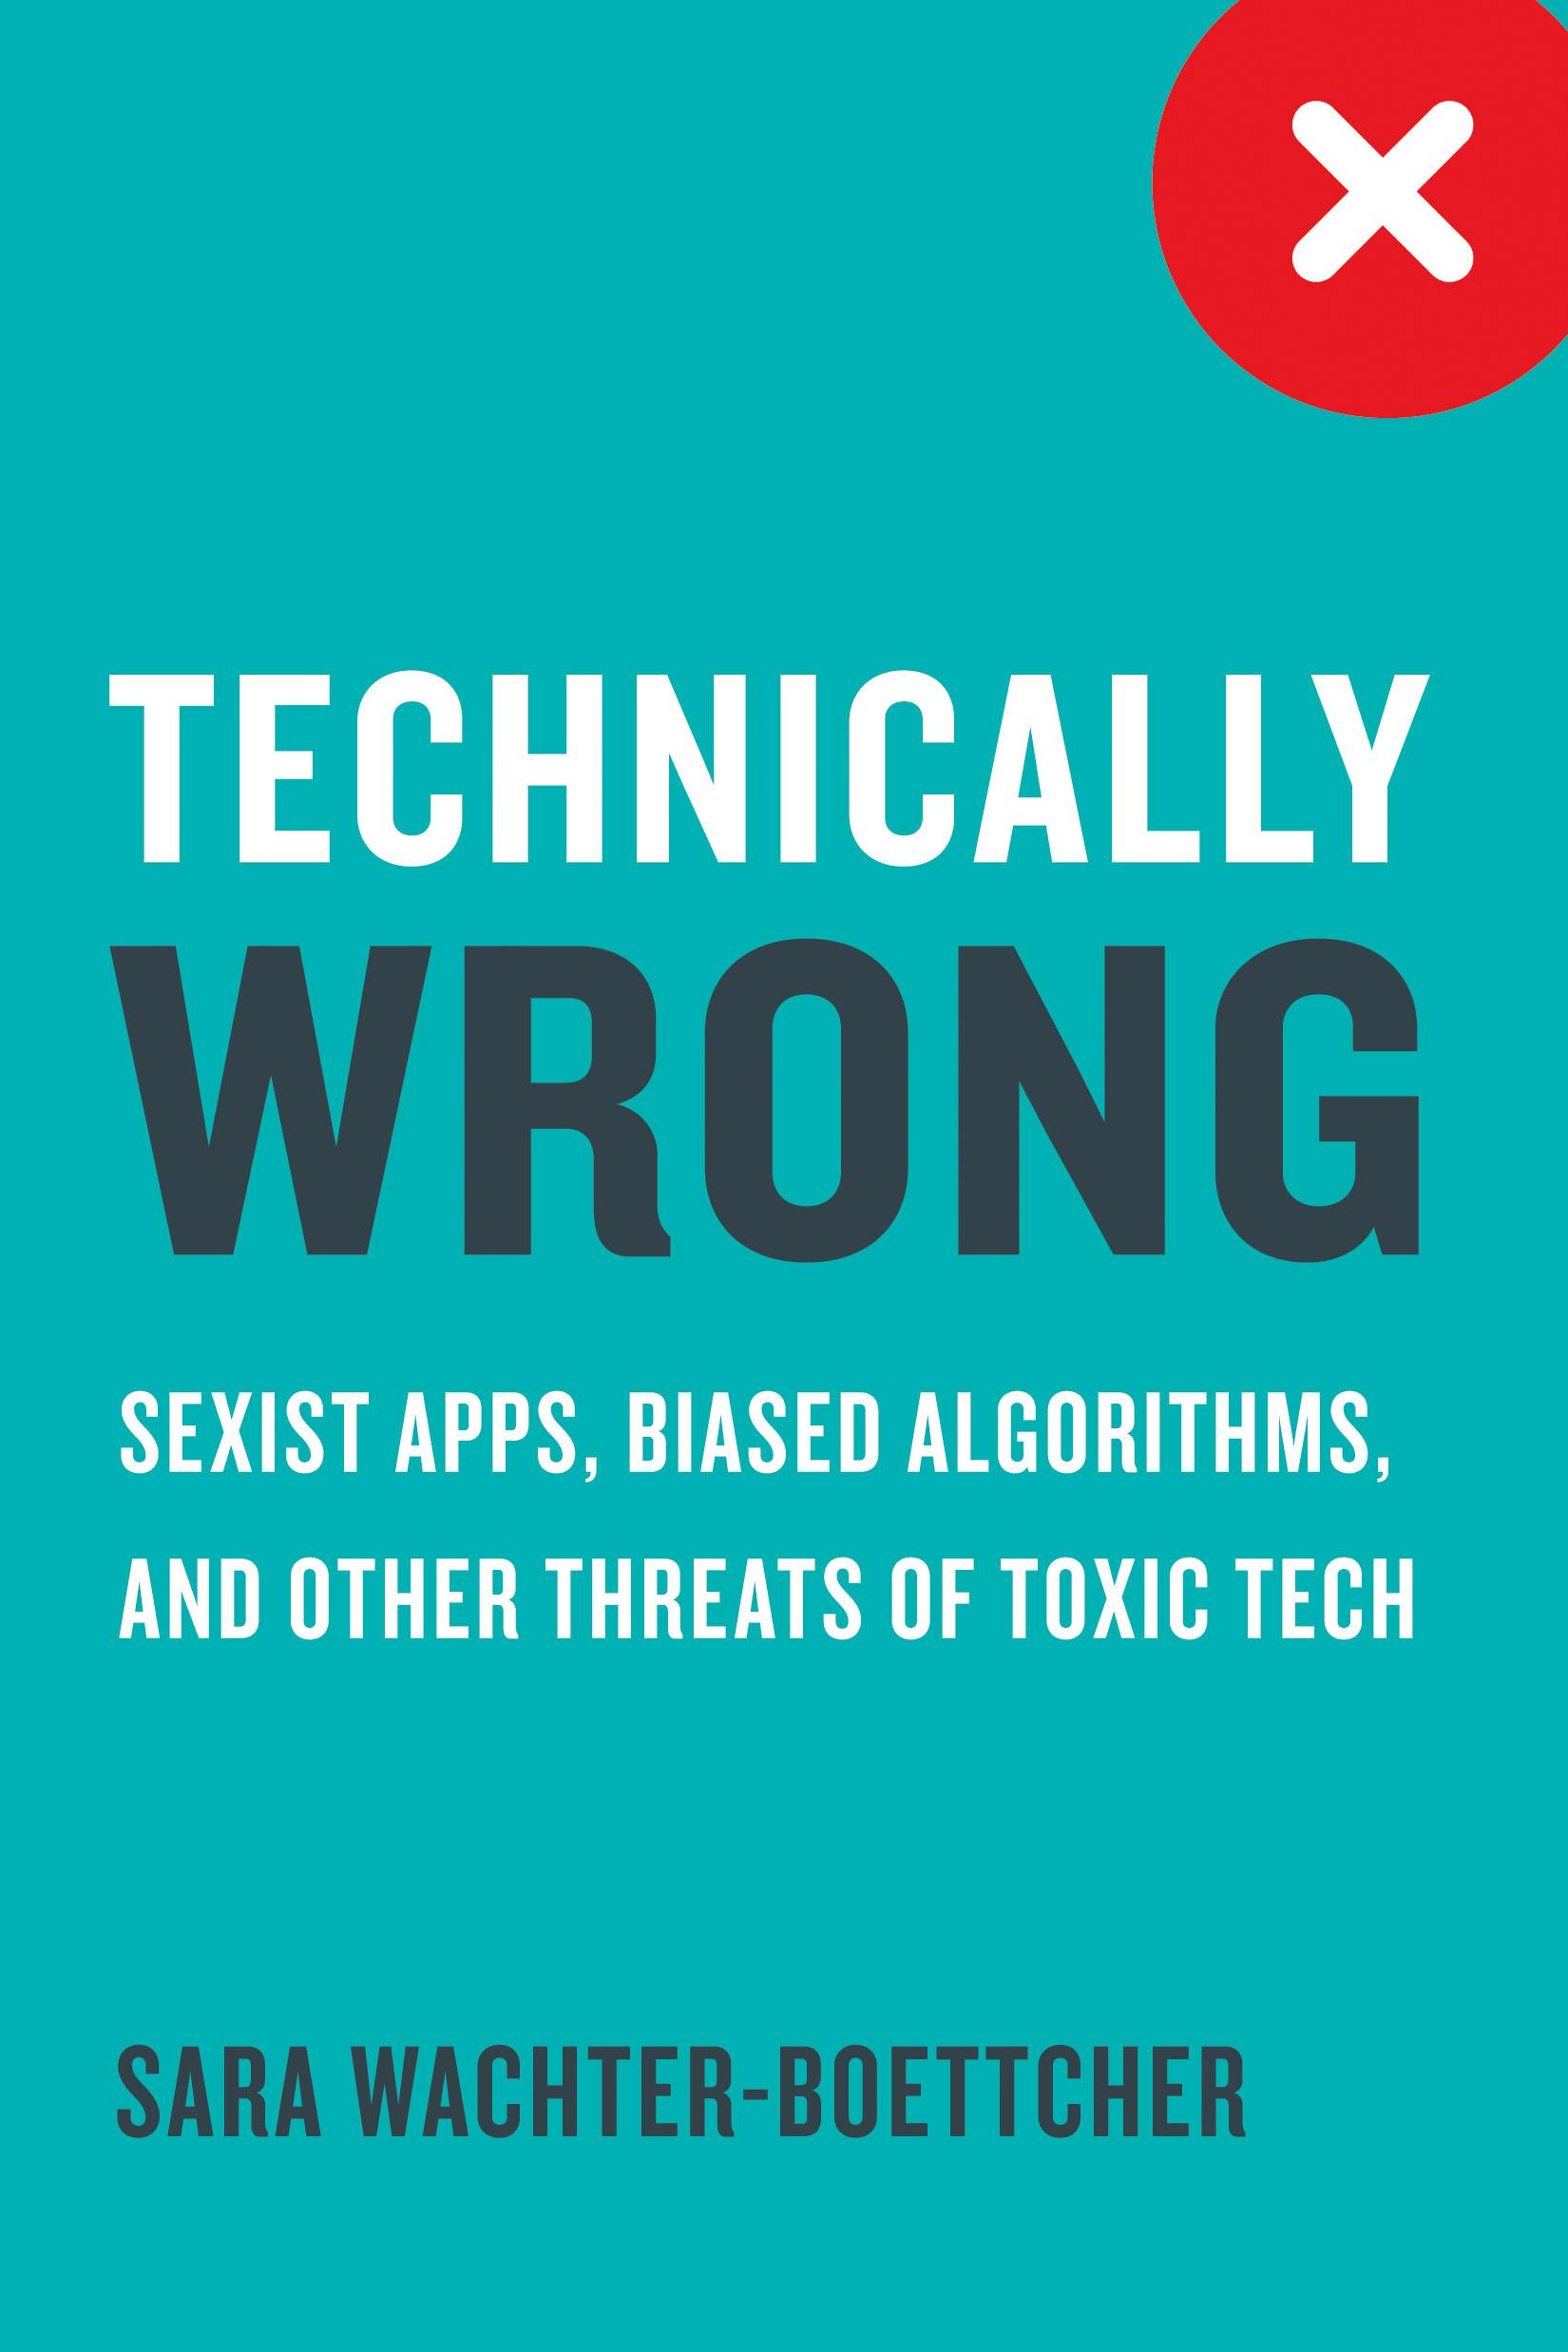 Technically Wrong_978-0-393-63463-1.jpg